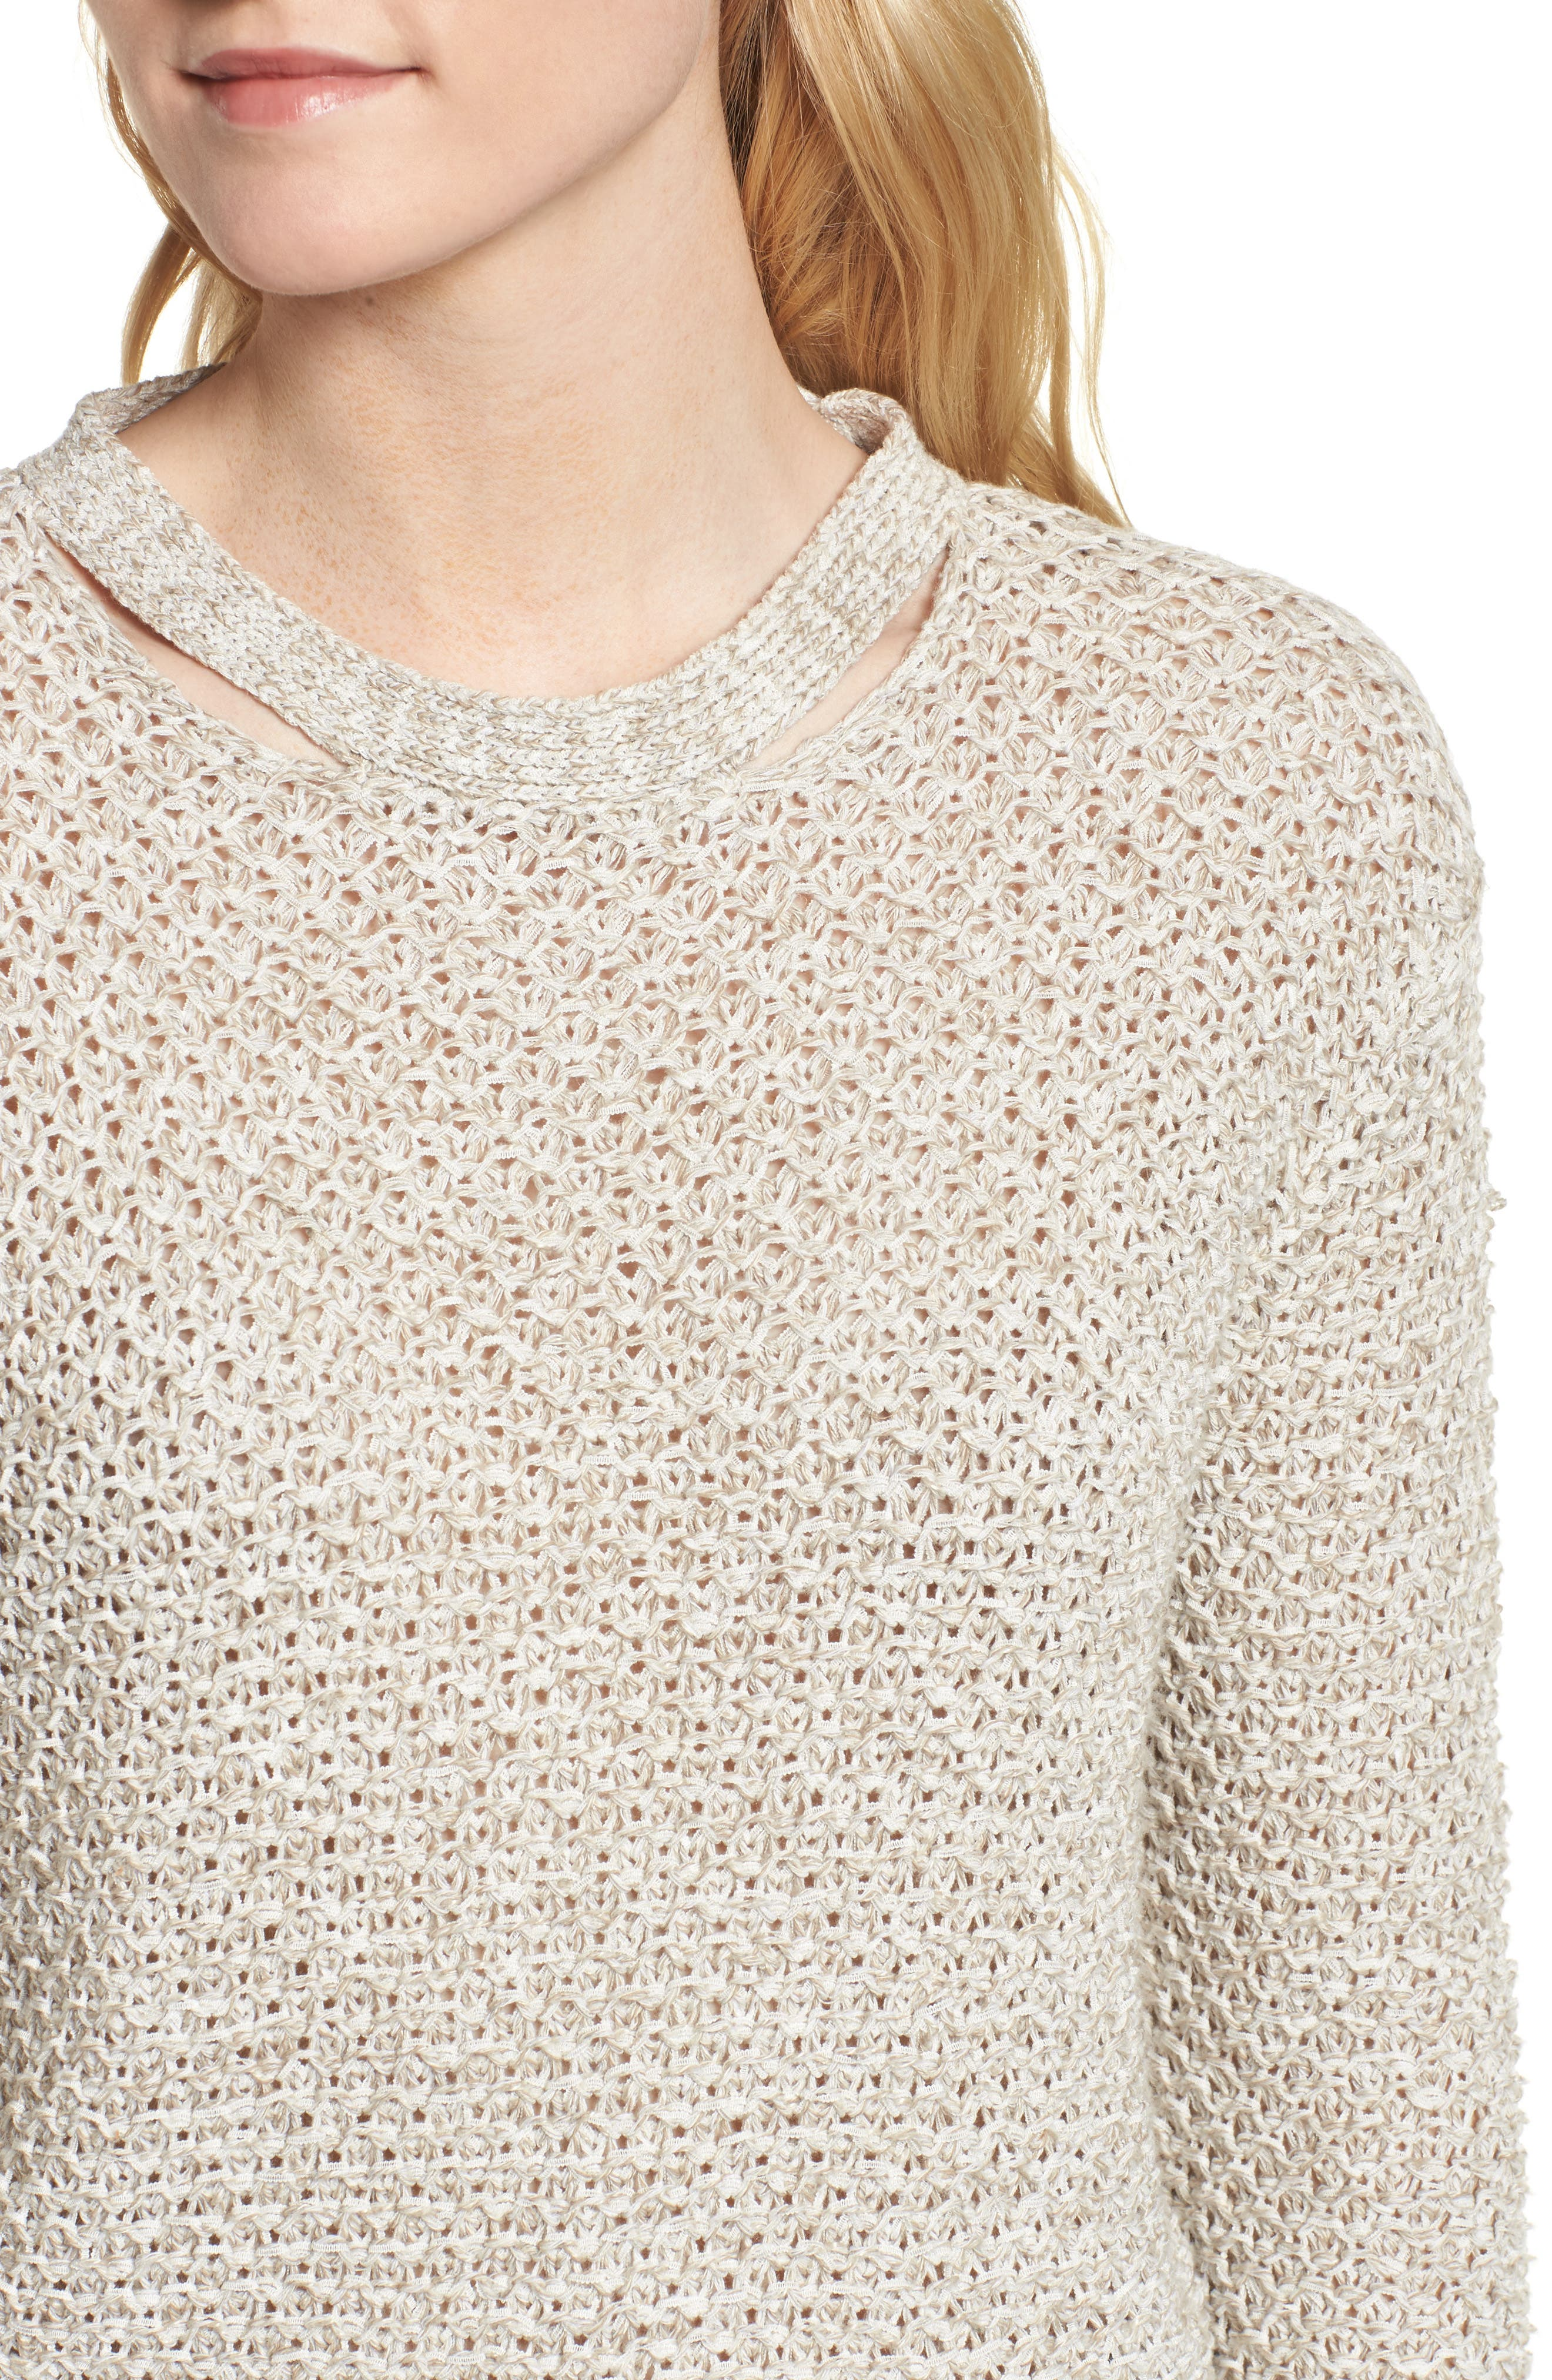 Mélange Open Back Sweater,                             Alternate thumbnail 4, color,                             238